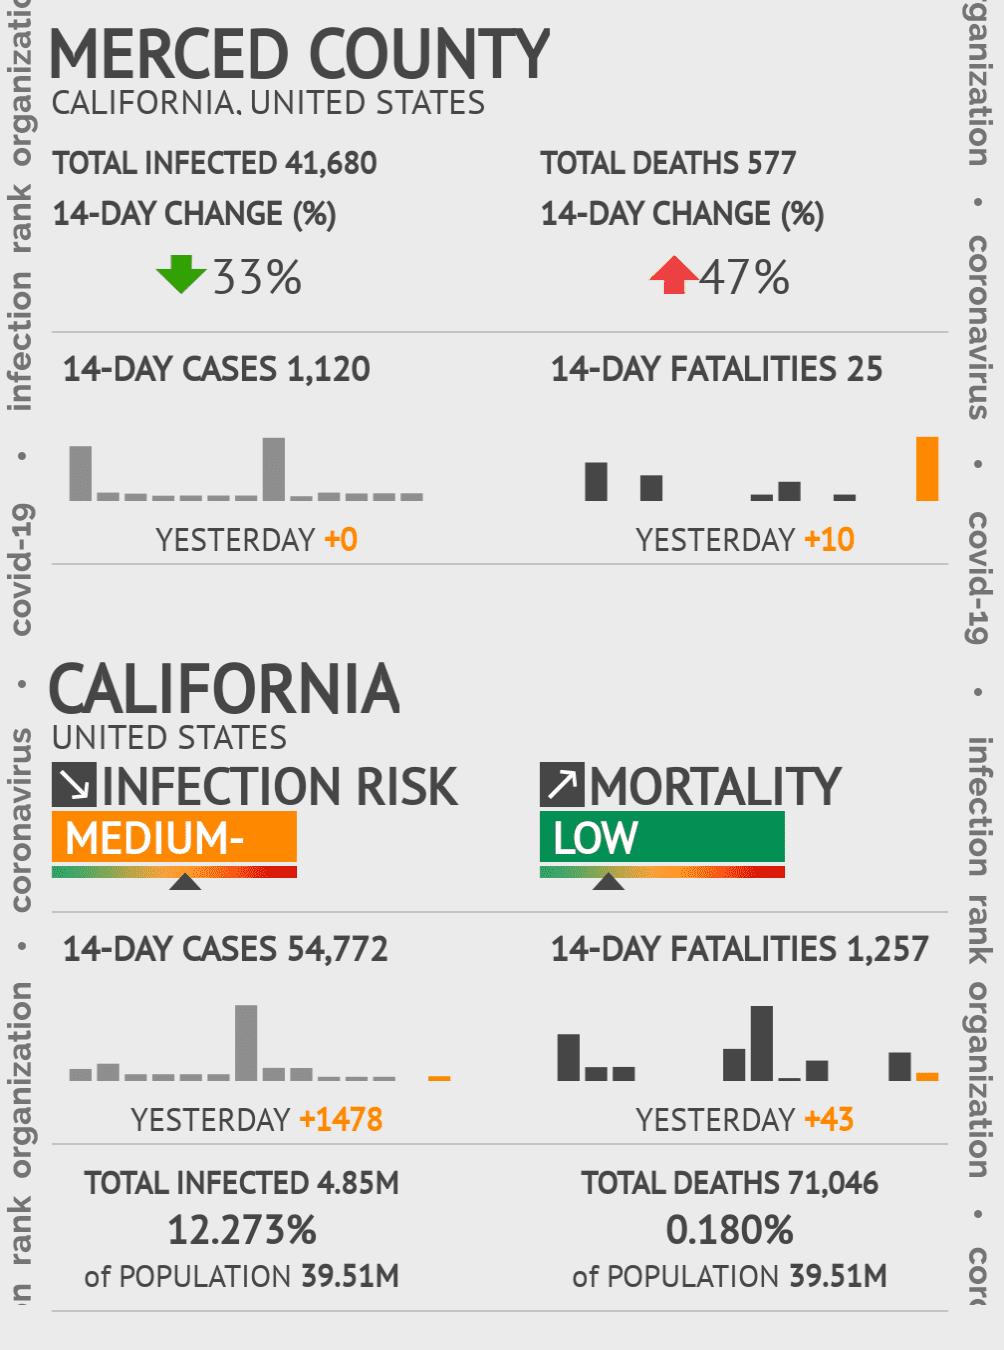 Merced County Coronavirus Covid-19 Risk of Infection on October 18, 2020